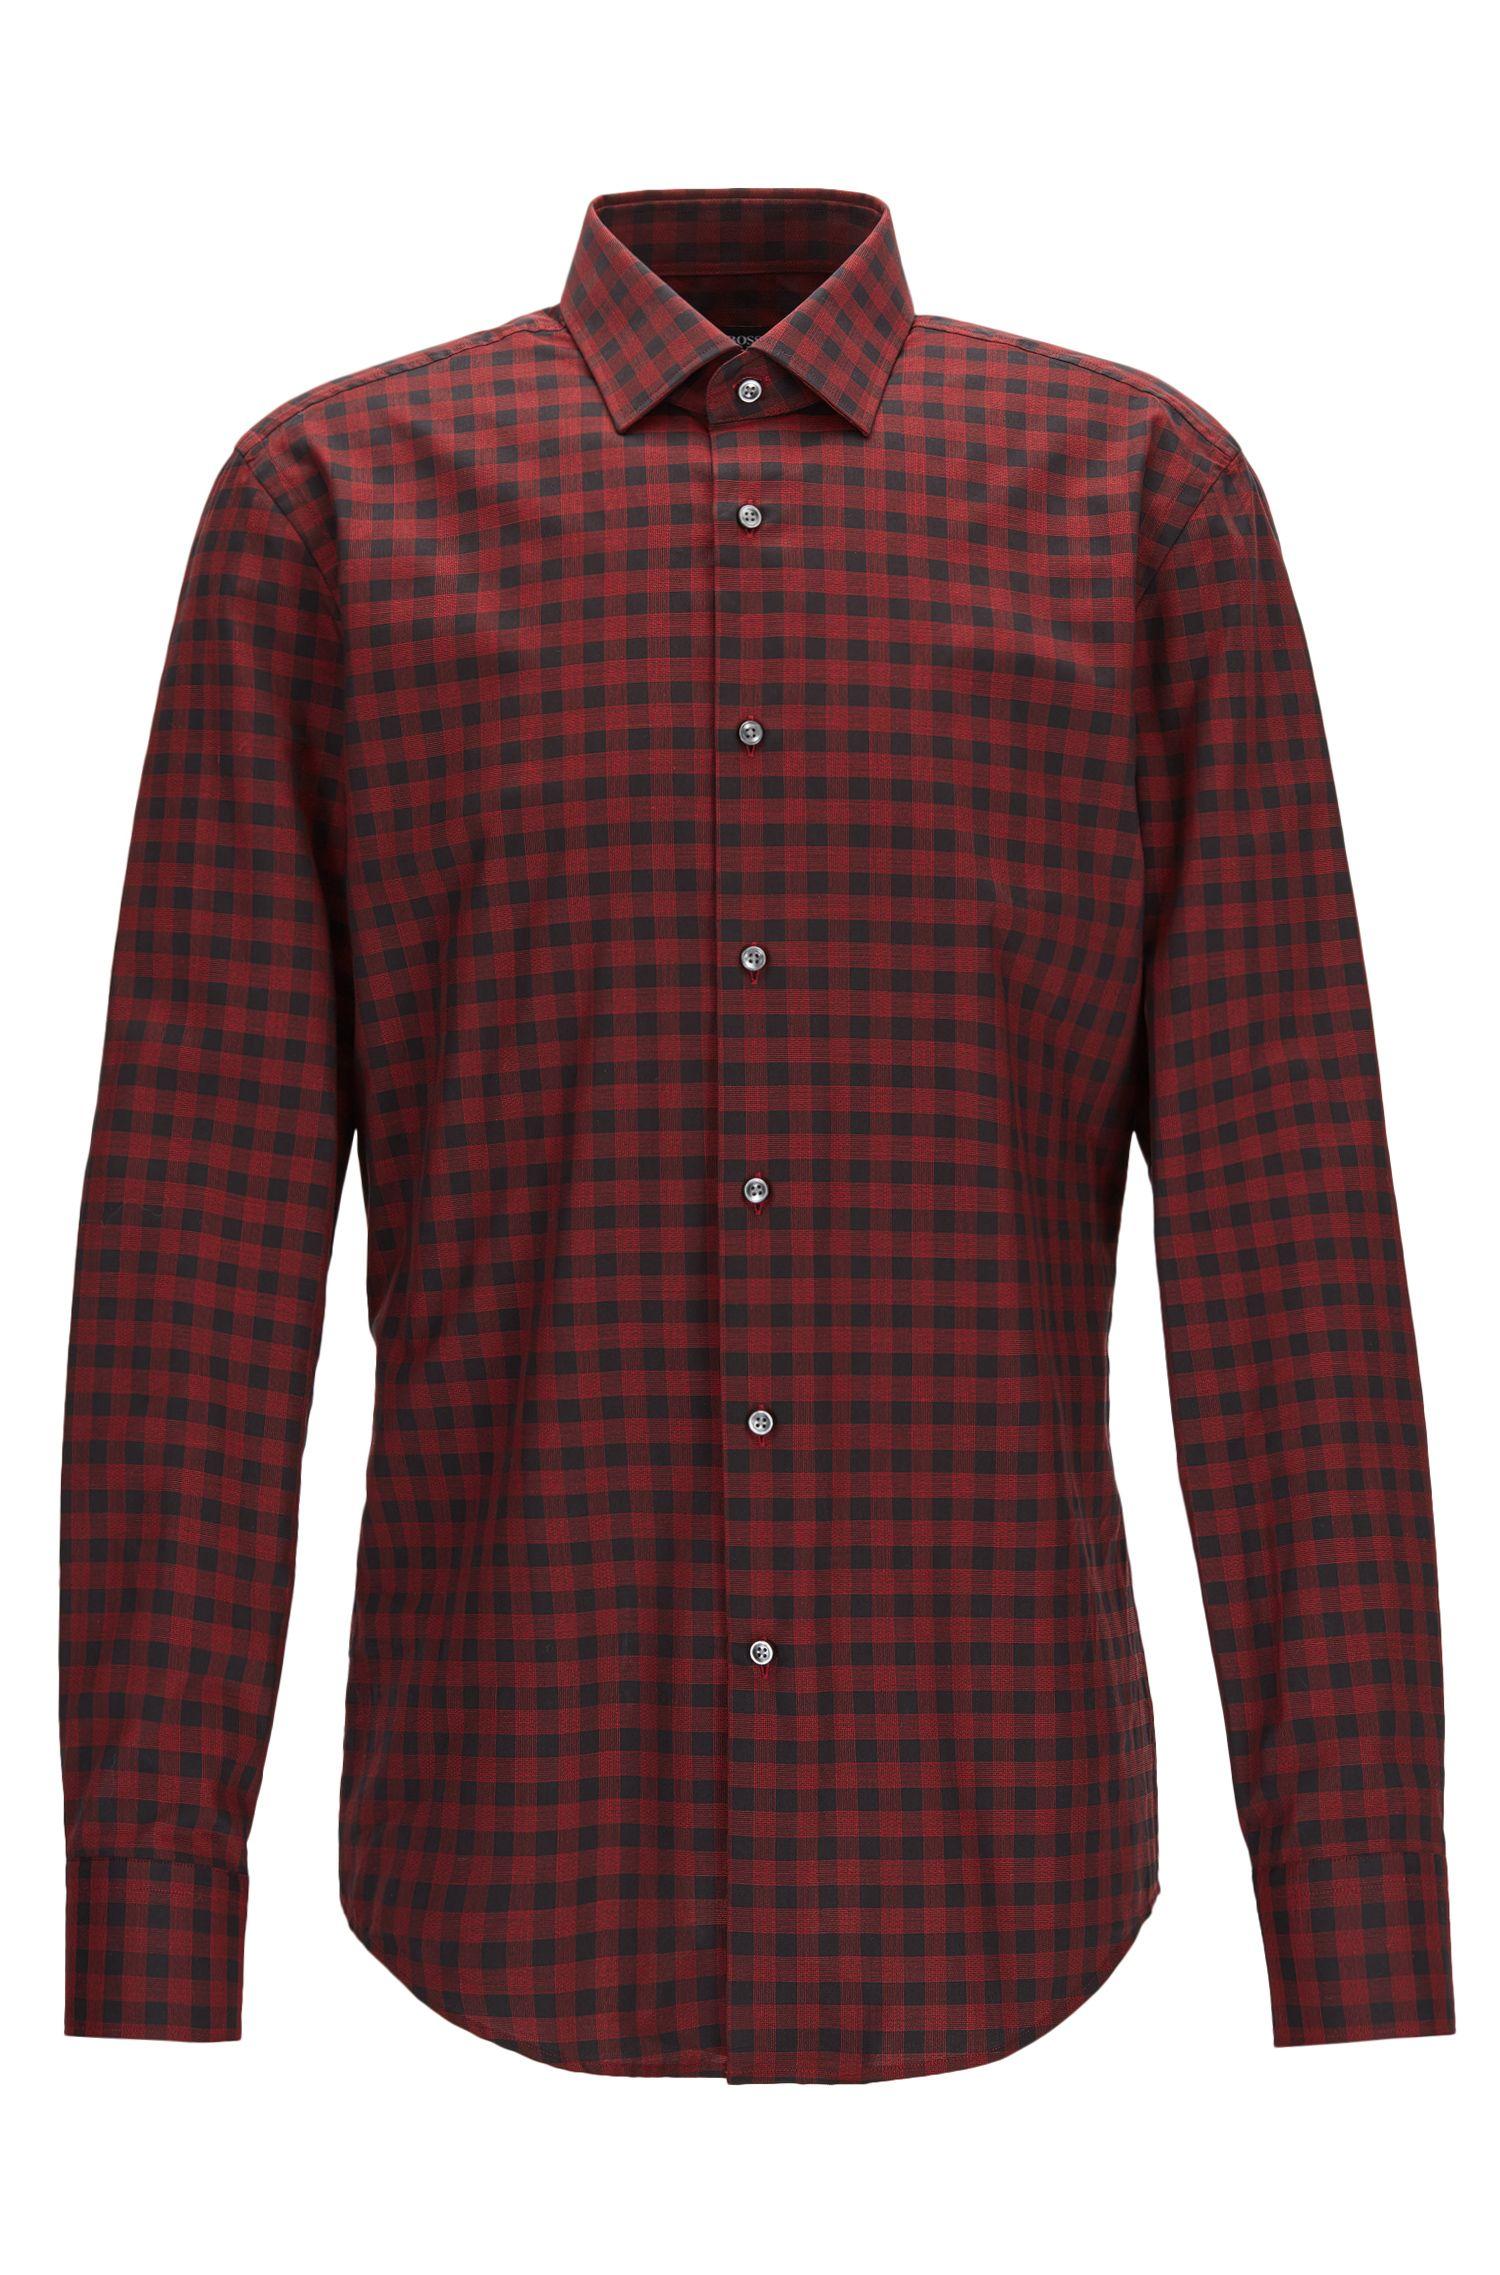 Gingham Cotton Dress Shirt, Slim Fit | Jenno, Red